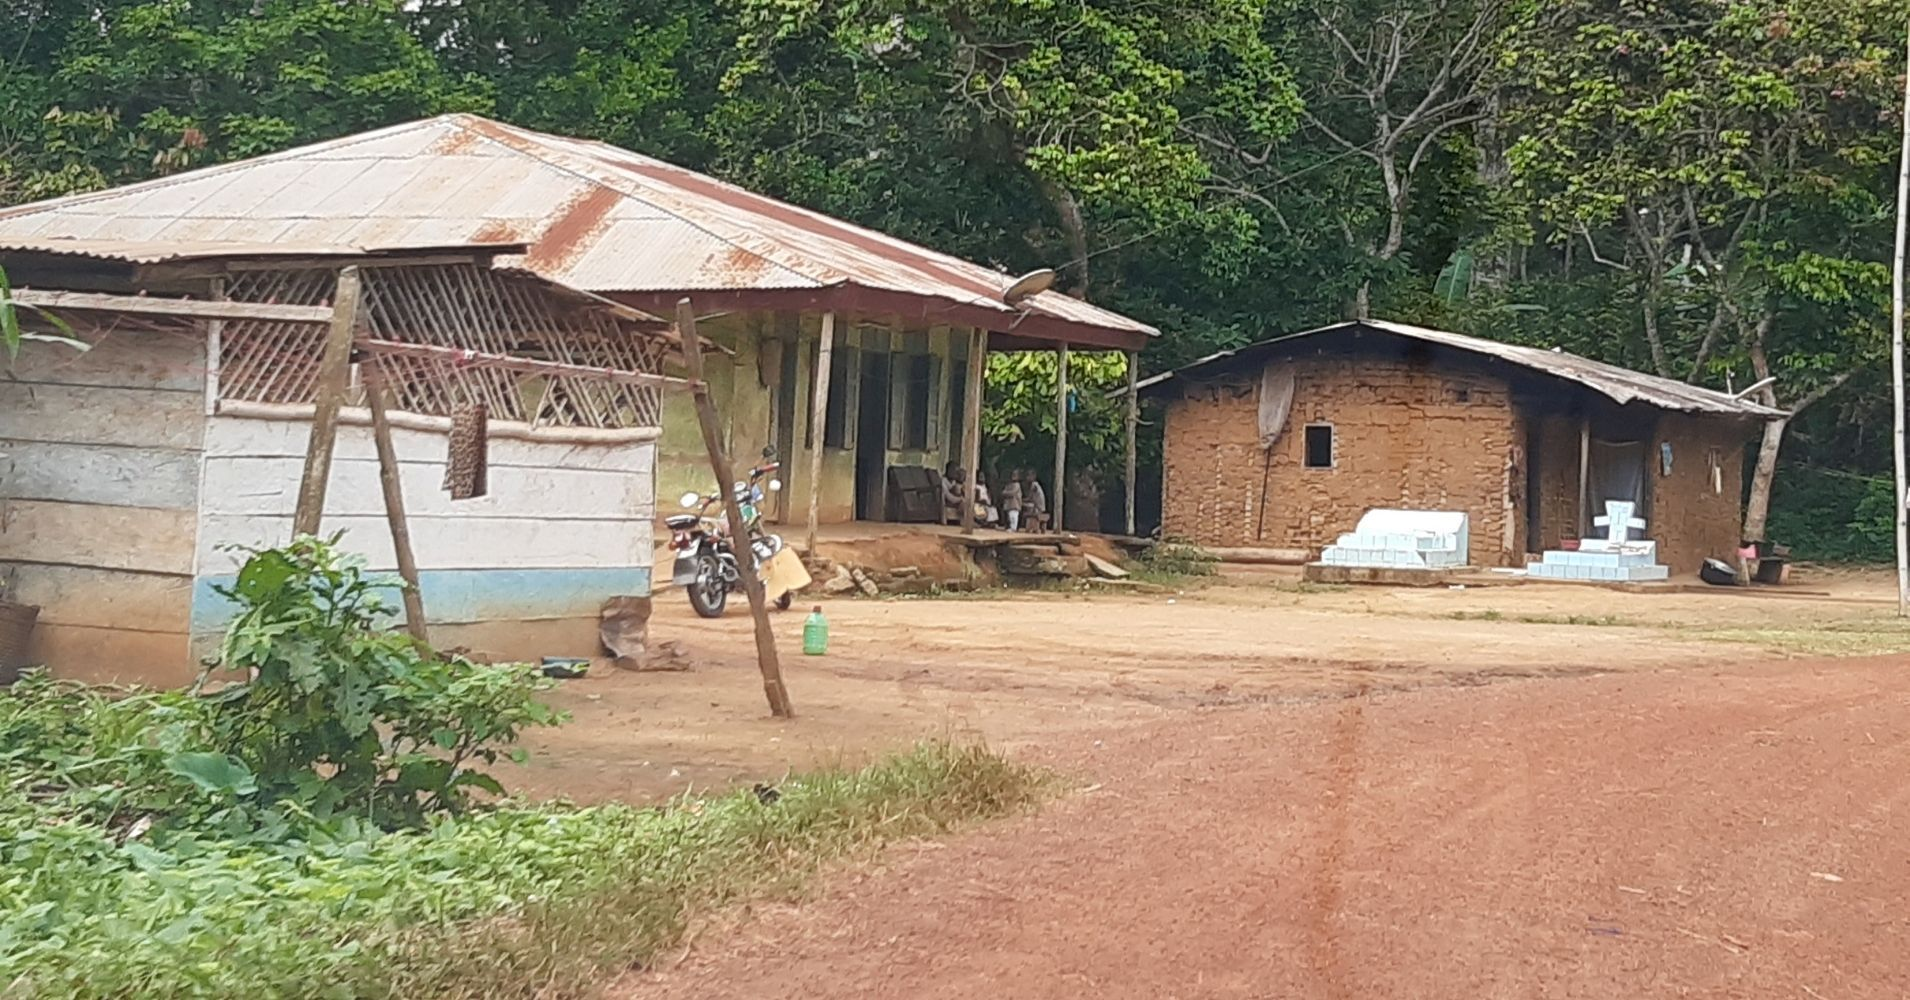 Centro Turístico de Ebogo, Camerún.